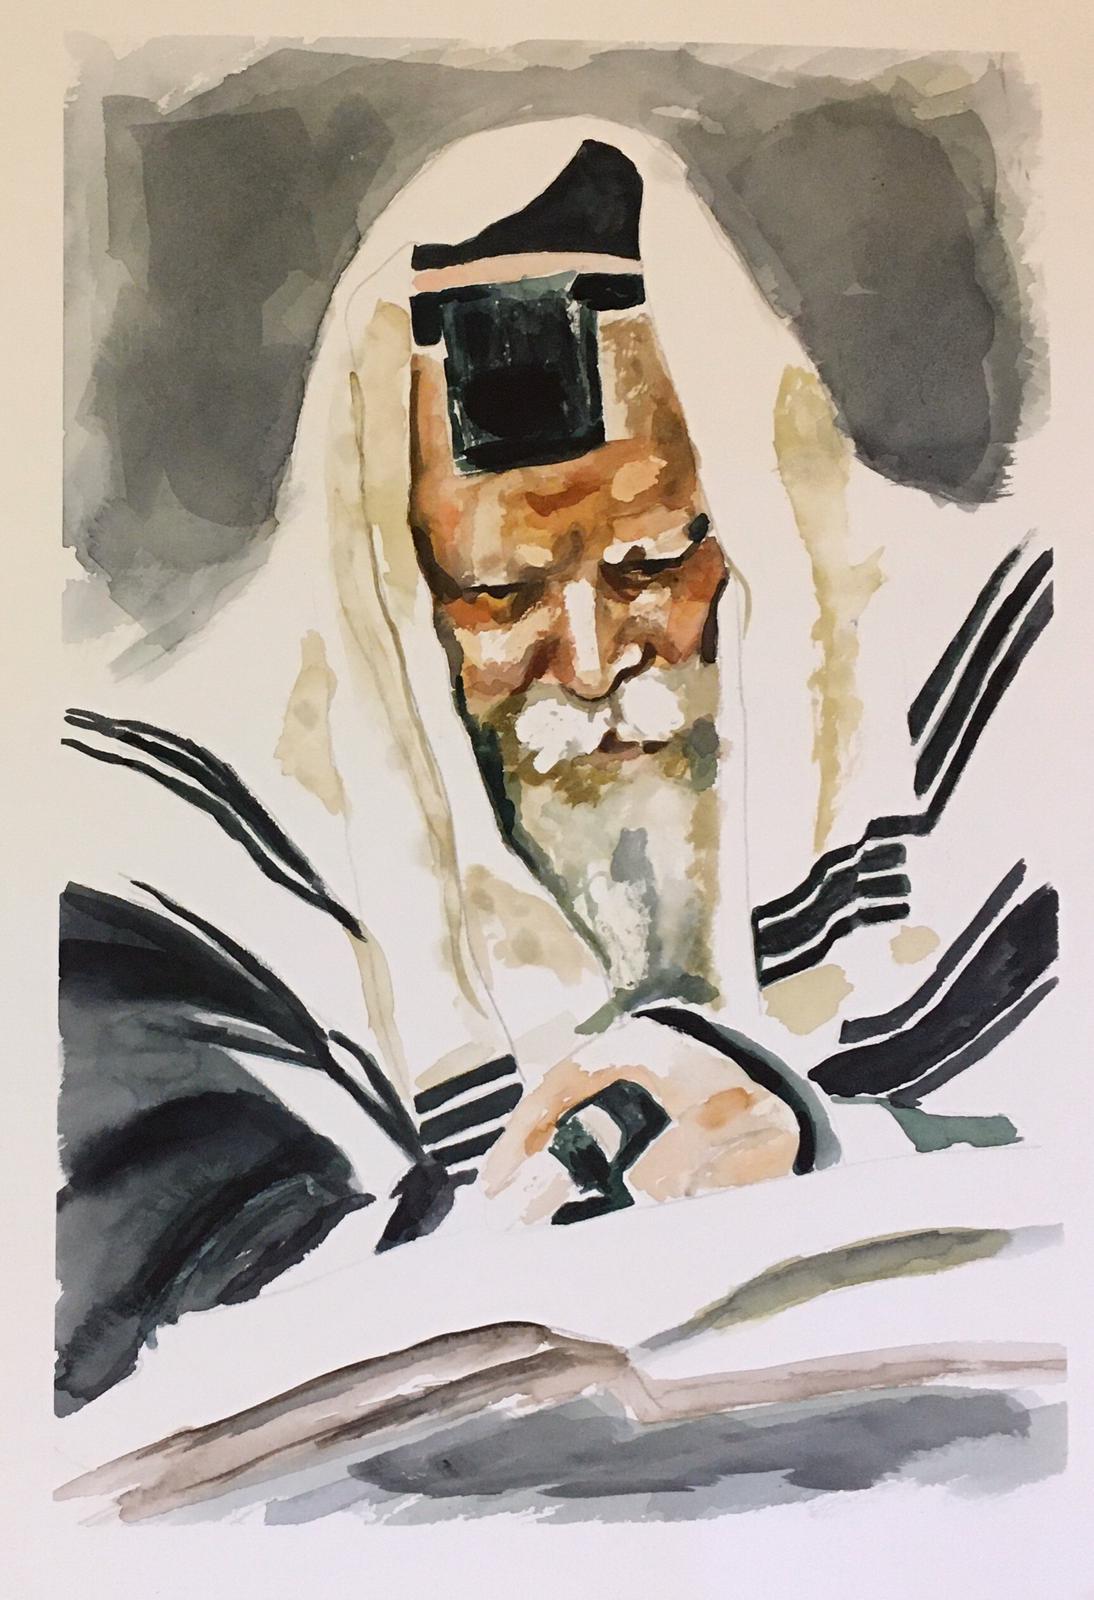 Rabbi sous le Talith - 1 770 shekels